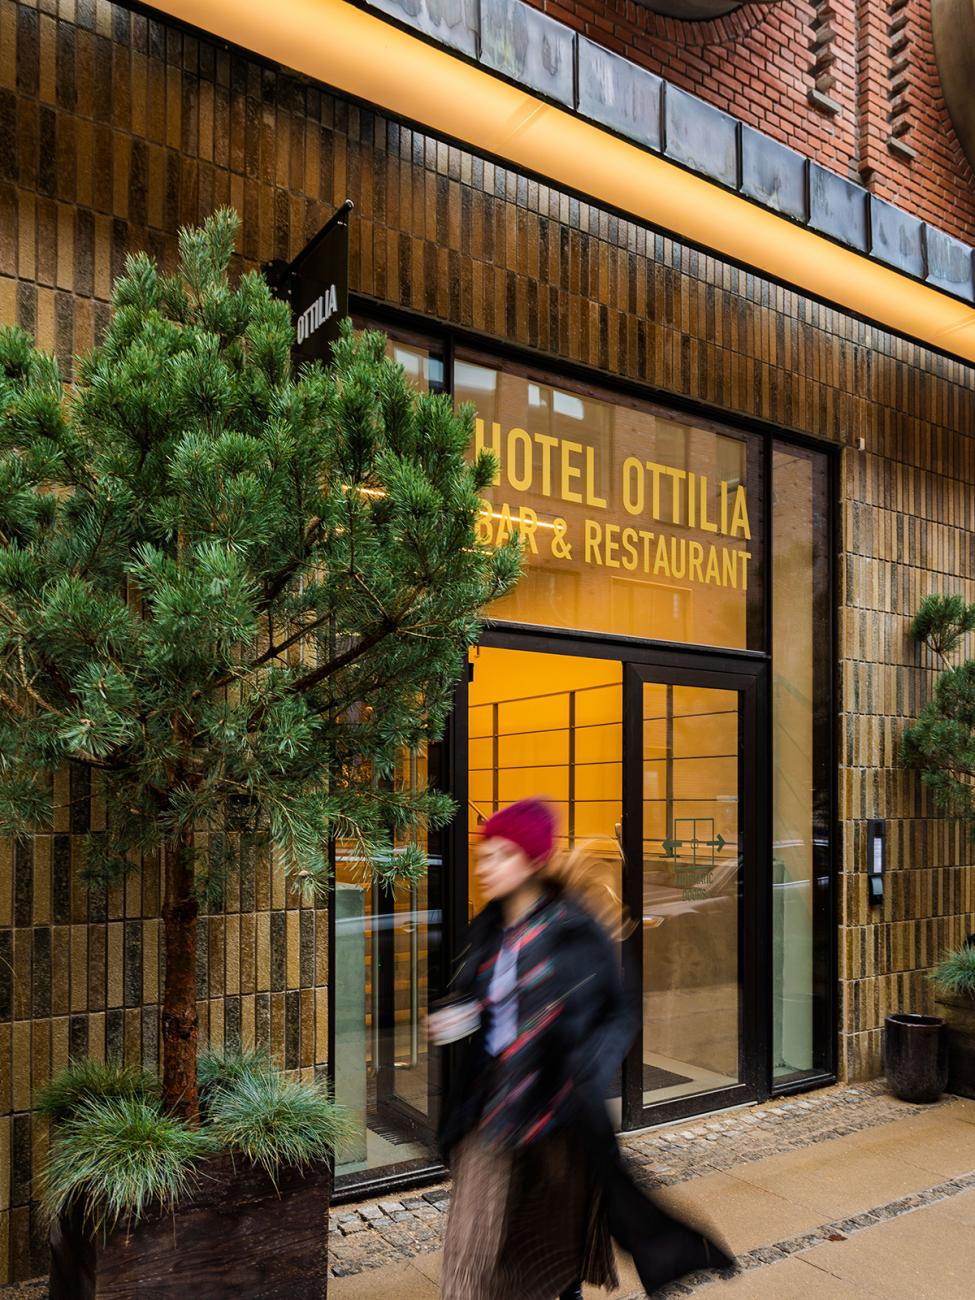 hotel ottilia indgang